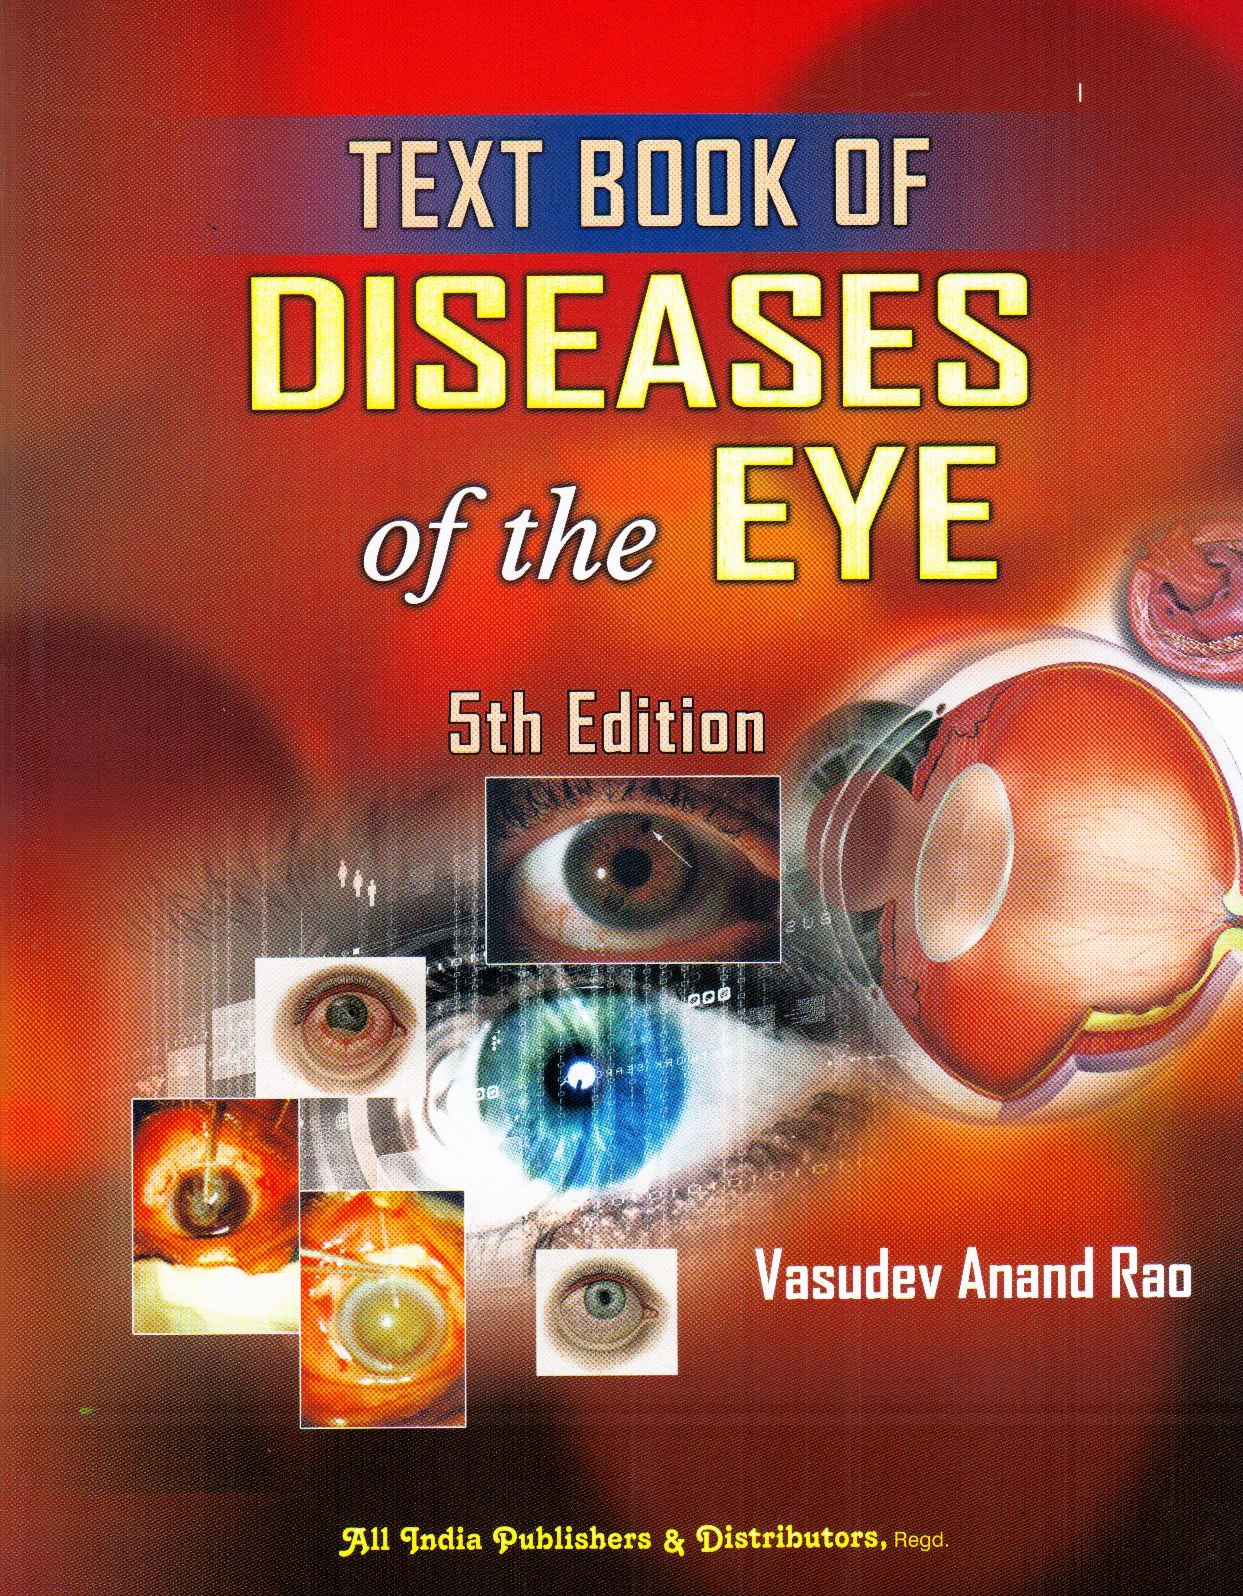 Скан и перевод книги про болезни глаз человека